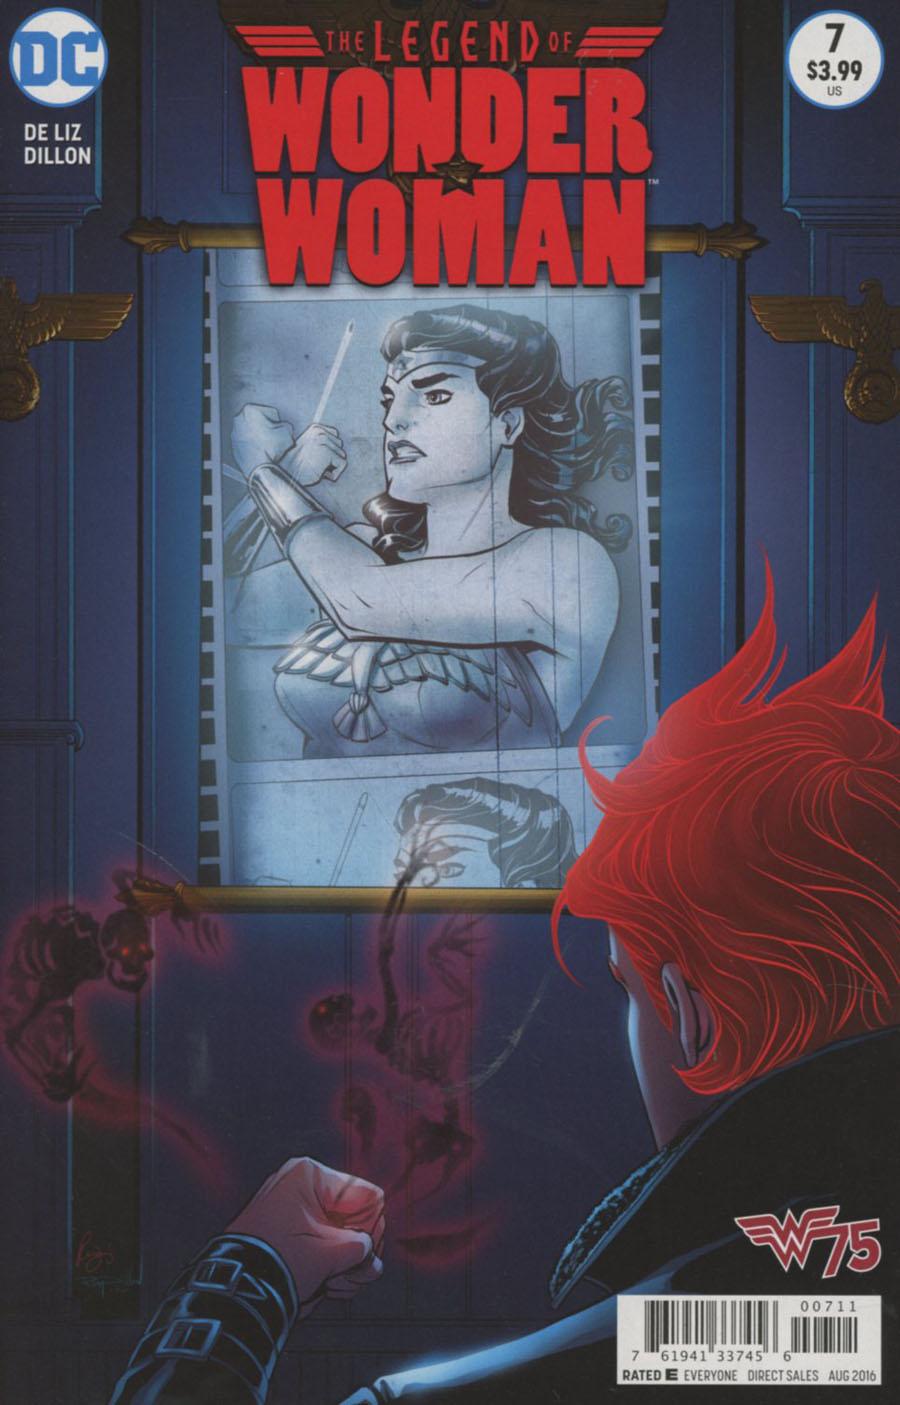 Legend Of Wonder Woman Vol 2 #7